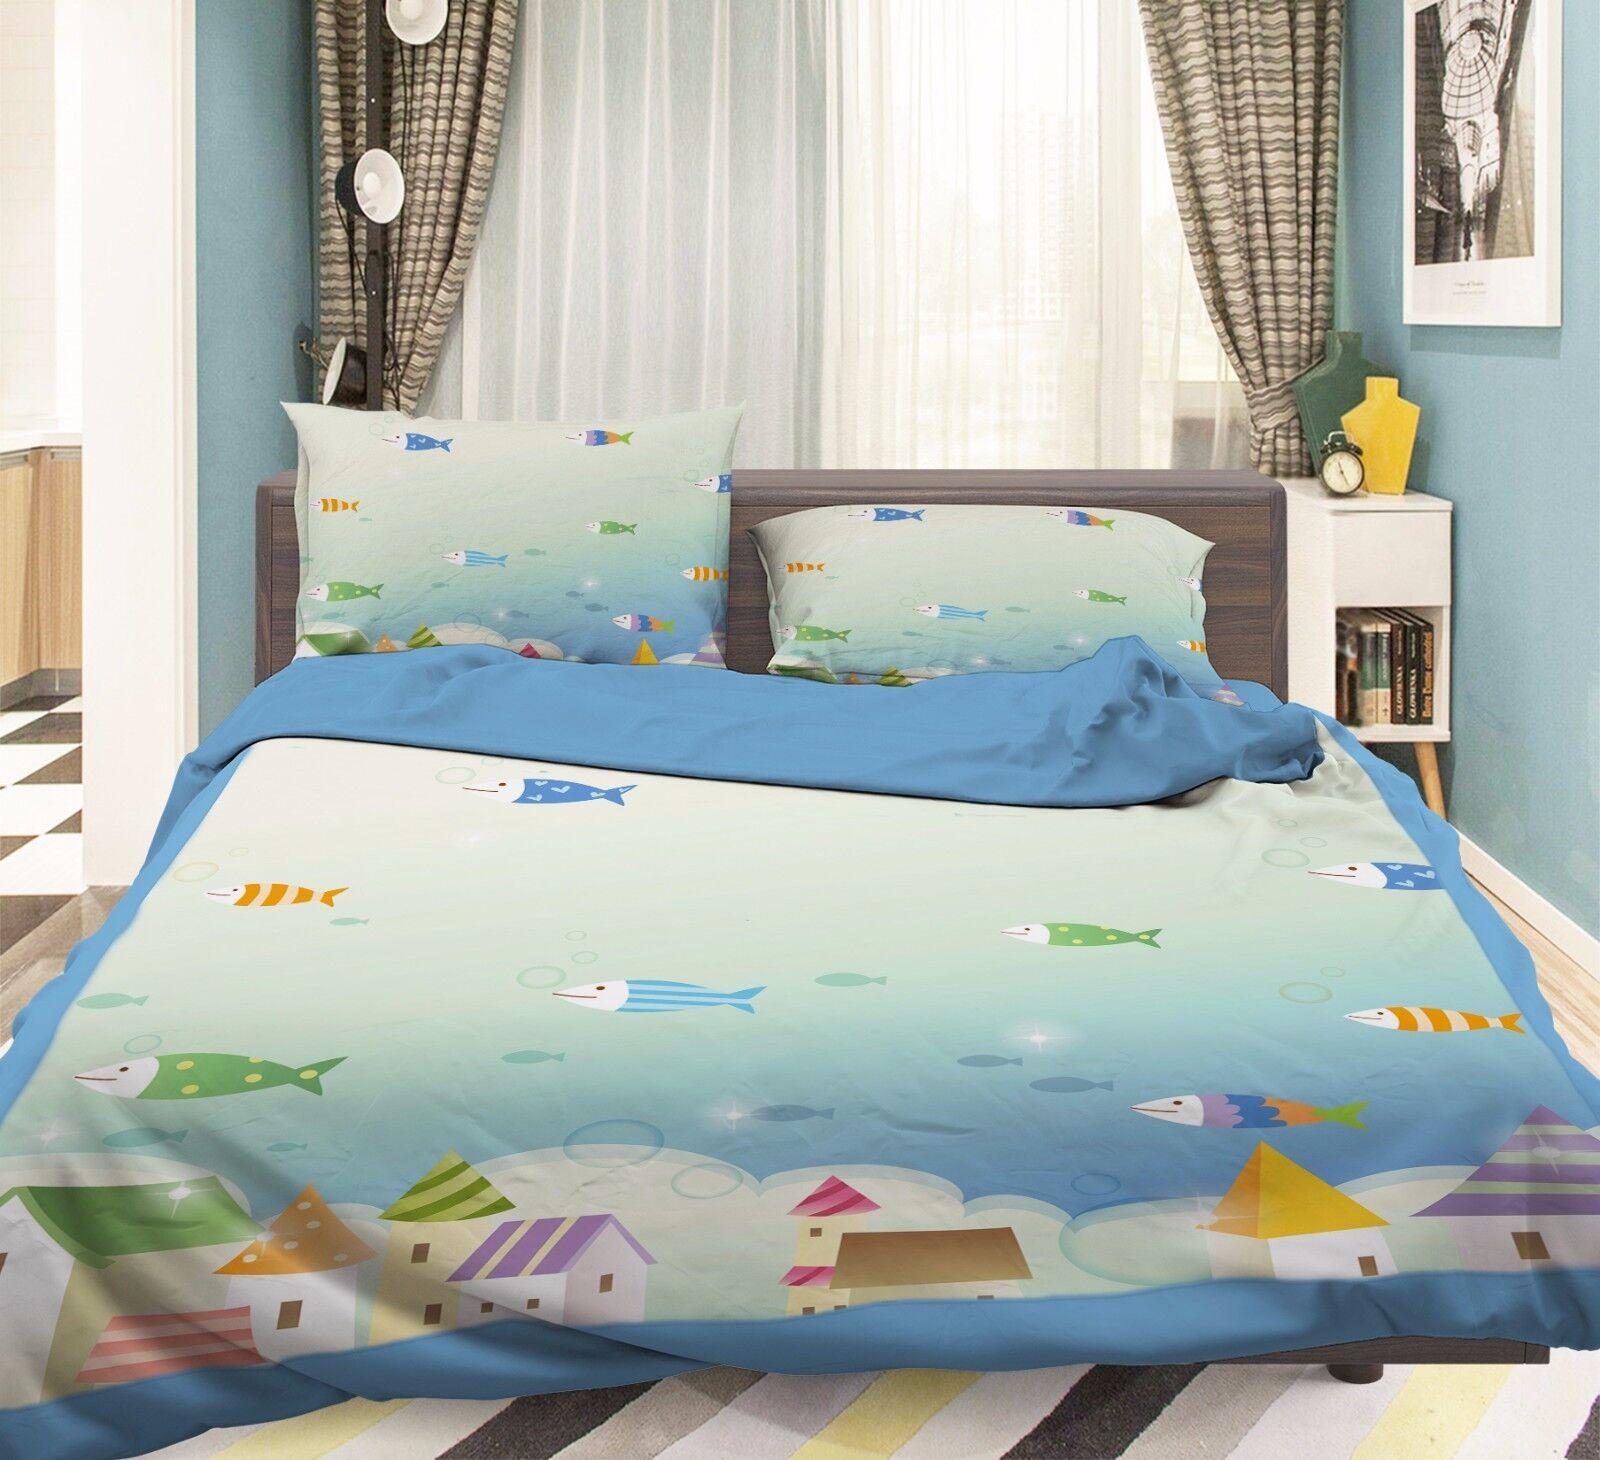 3D House Paint 906 Bed Pillowcases Quilt Duvet Cover Set Single Queen UK Summer